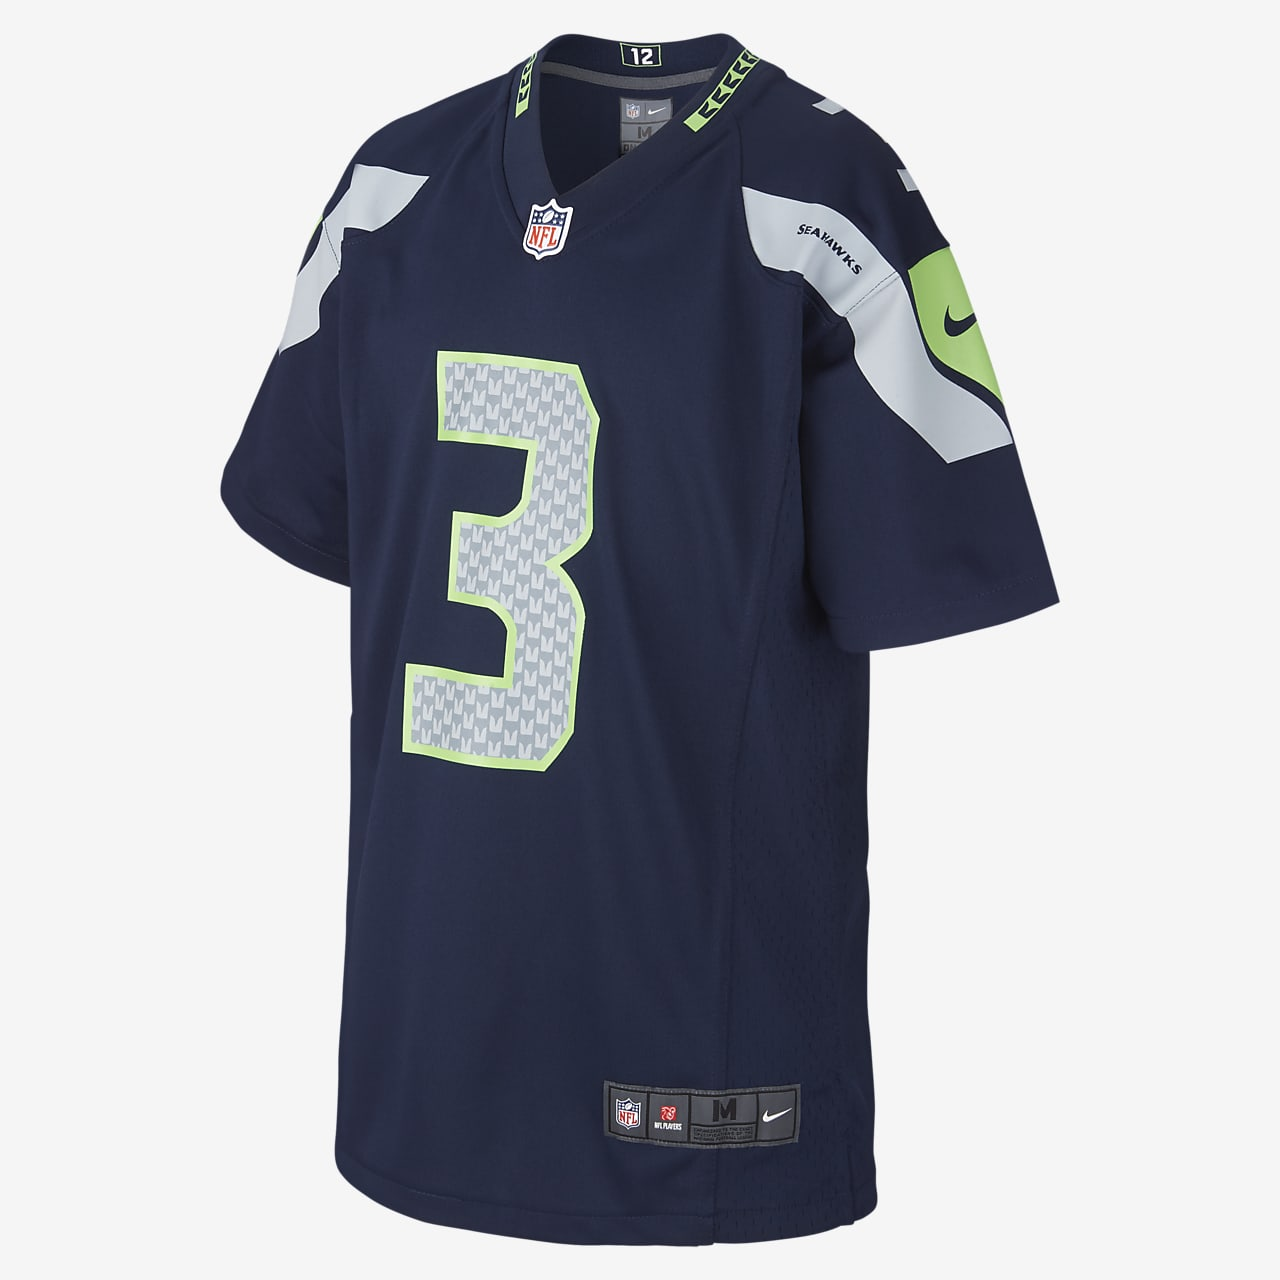 NFL Seattle Seahawks Game Jersey (Russell Wilson) Older Kids' American Football Jersey